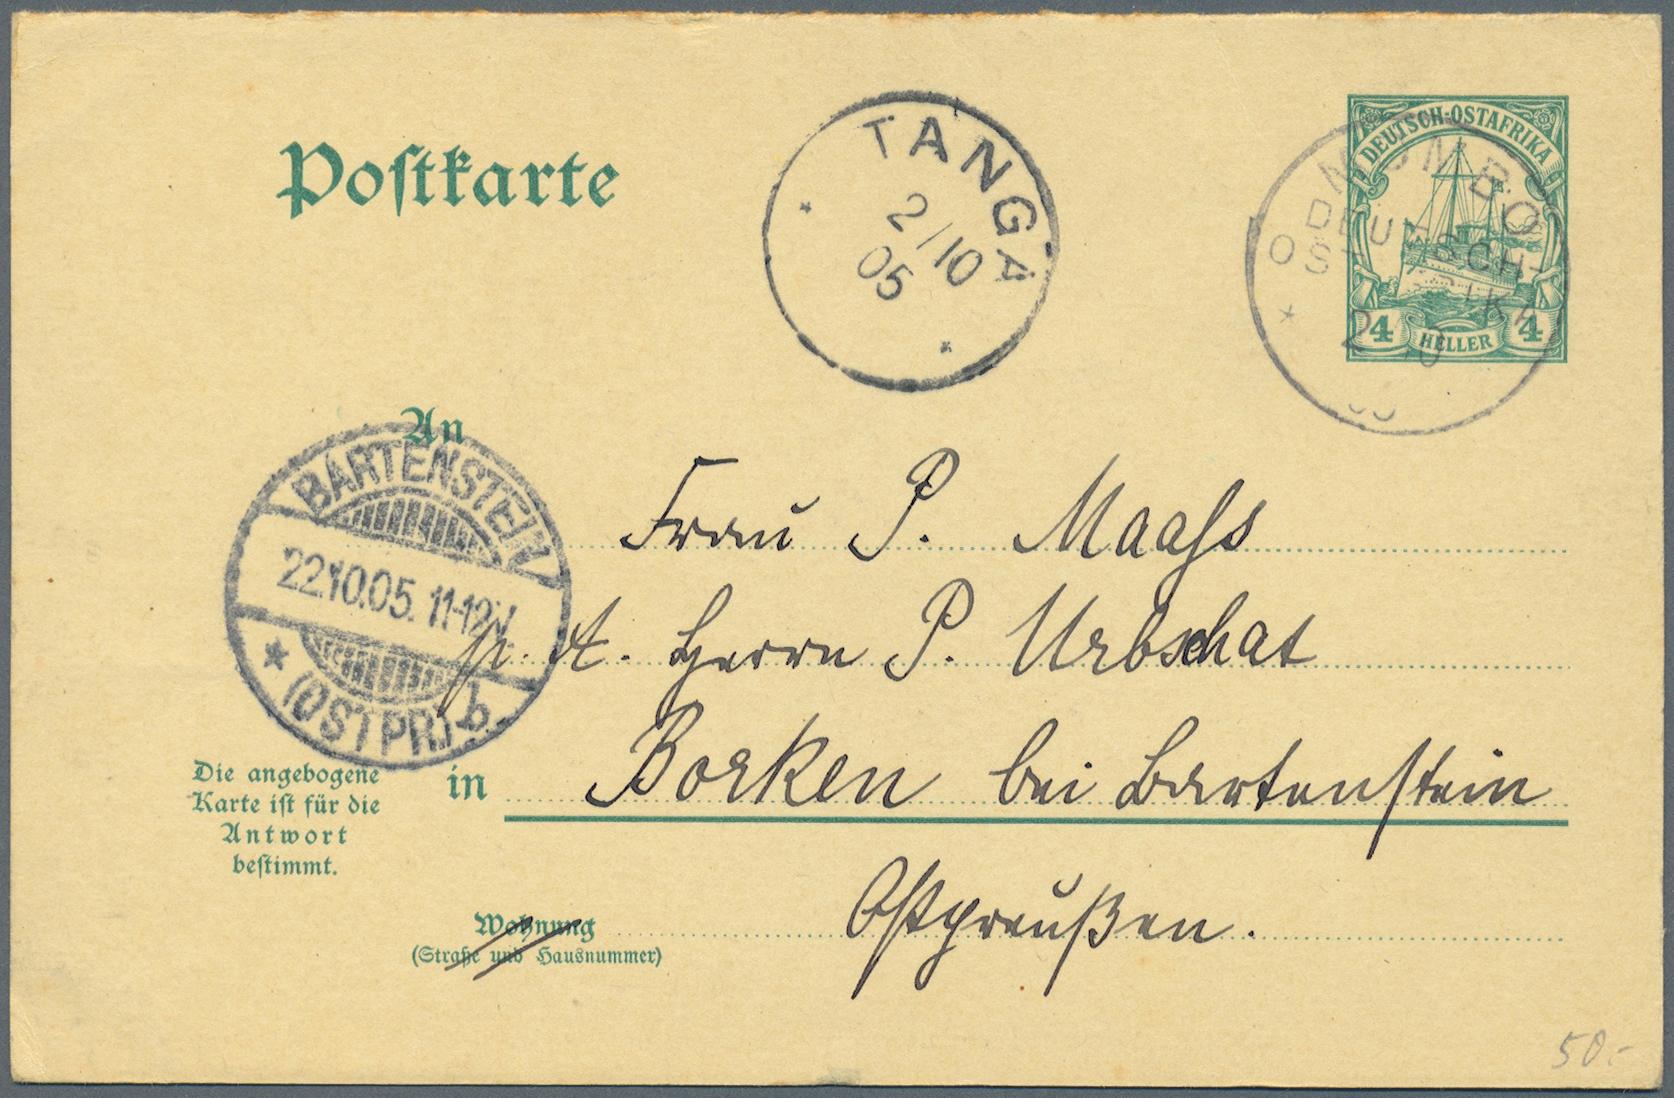 Lot 37204 - Deutsche Auslandspostämter + Kolonien  -  Auktionshaus Christoph Gärtner GmbH & Co. KG Collections Germany,  Collections Supplement, Surprise boxes #39 Day 7